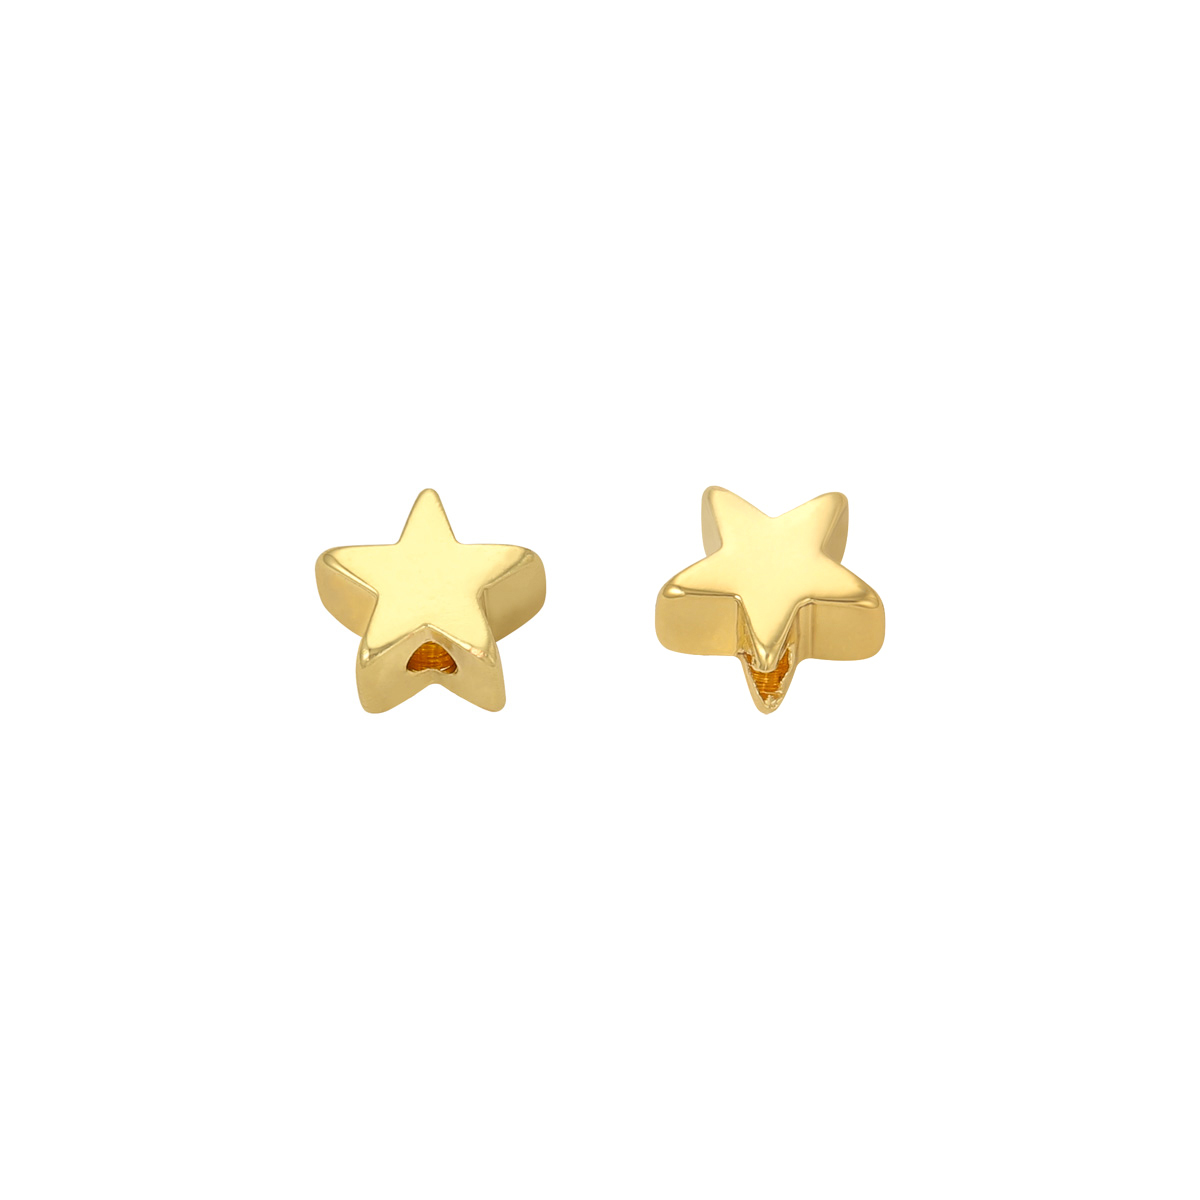 DIY Beads Star - 5.2MM